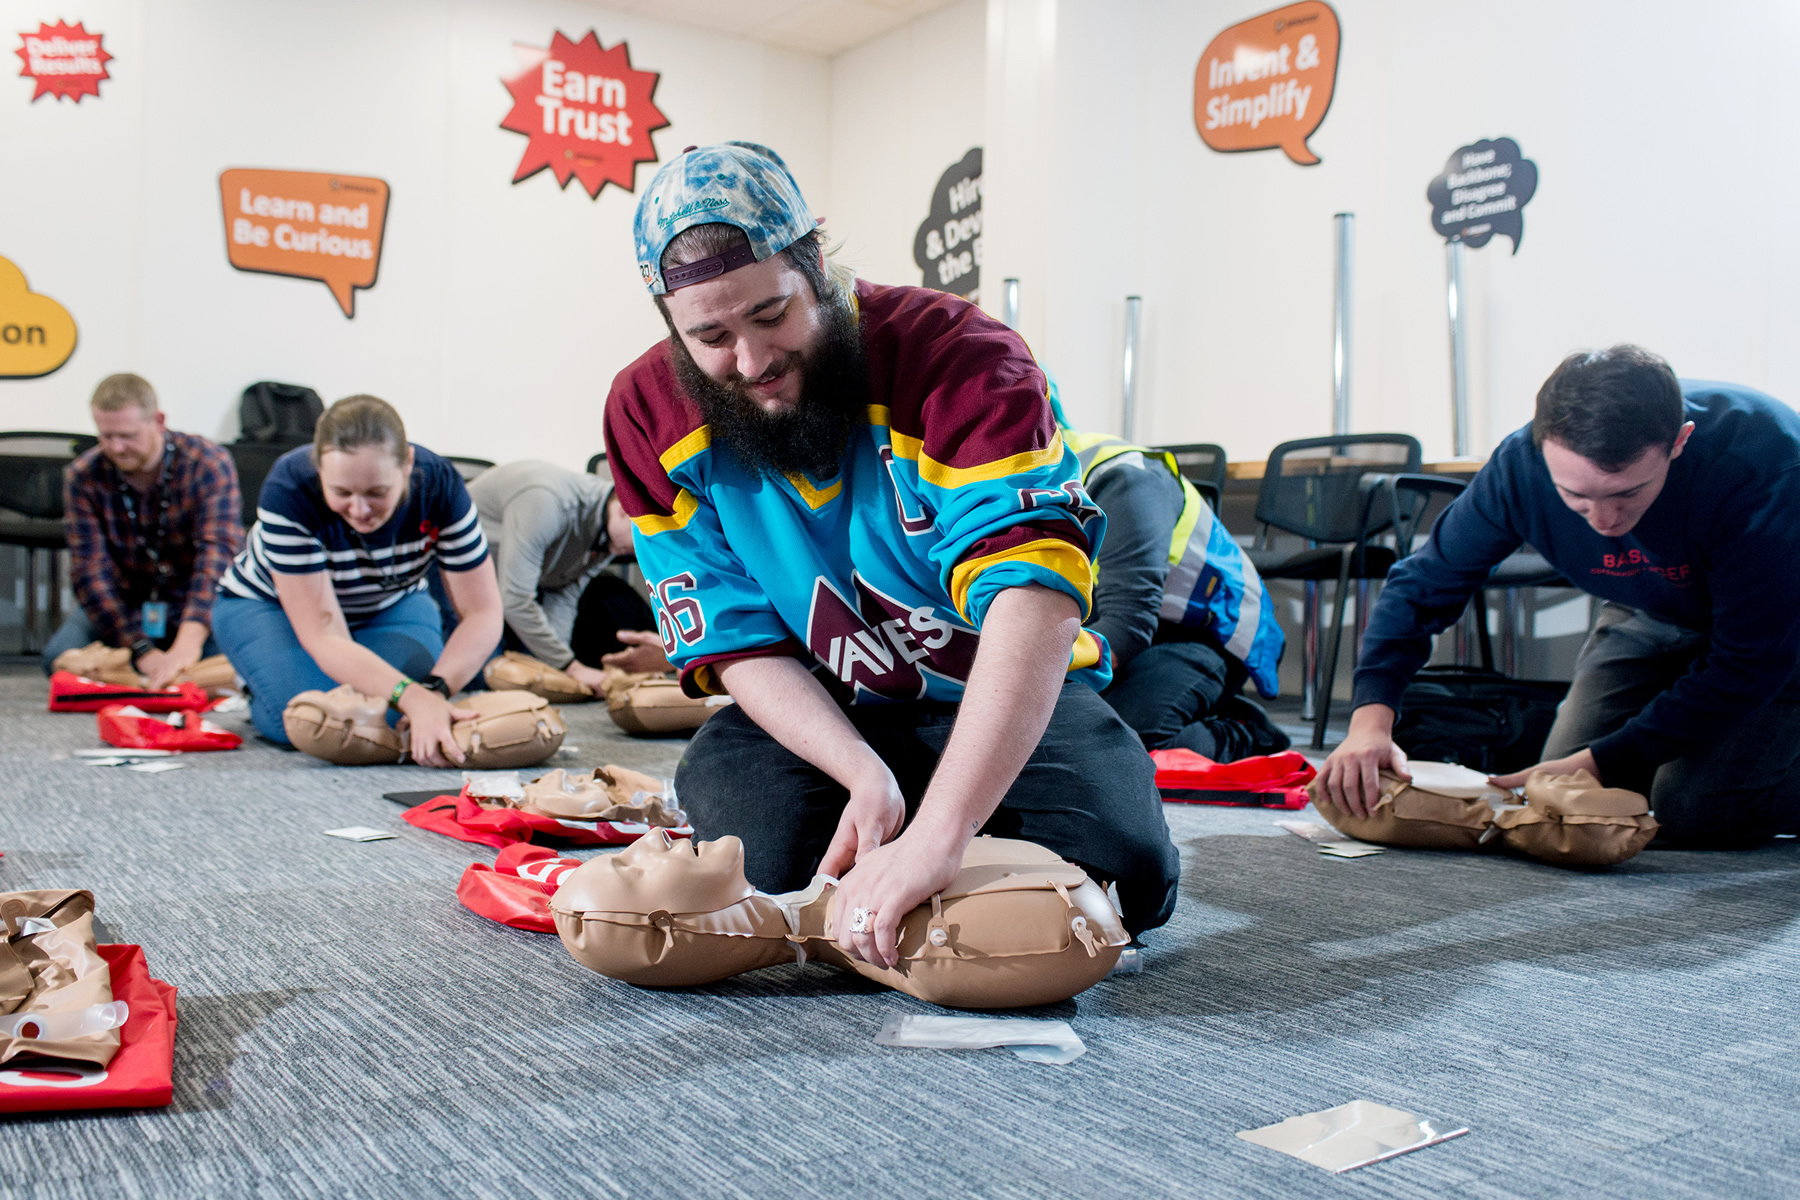 Amazon Weybridge staff practicing CPR on a dummy